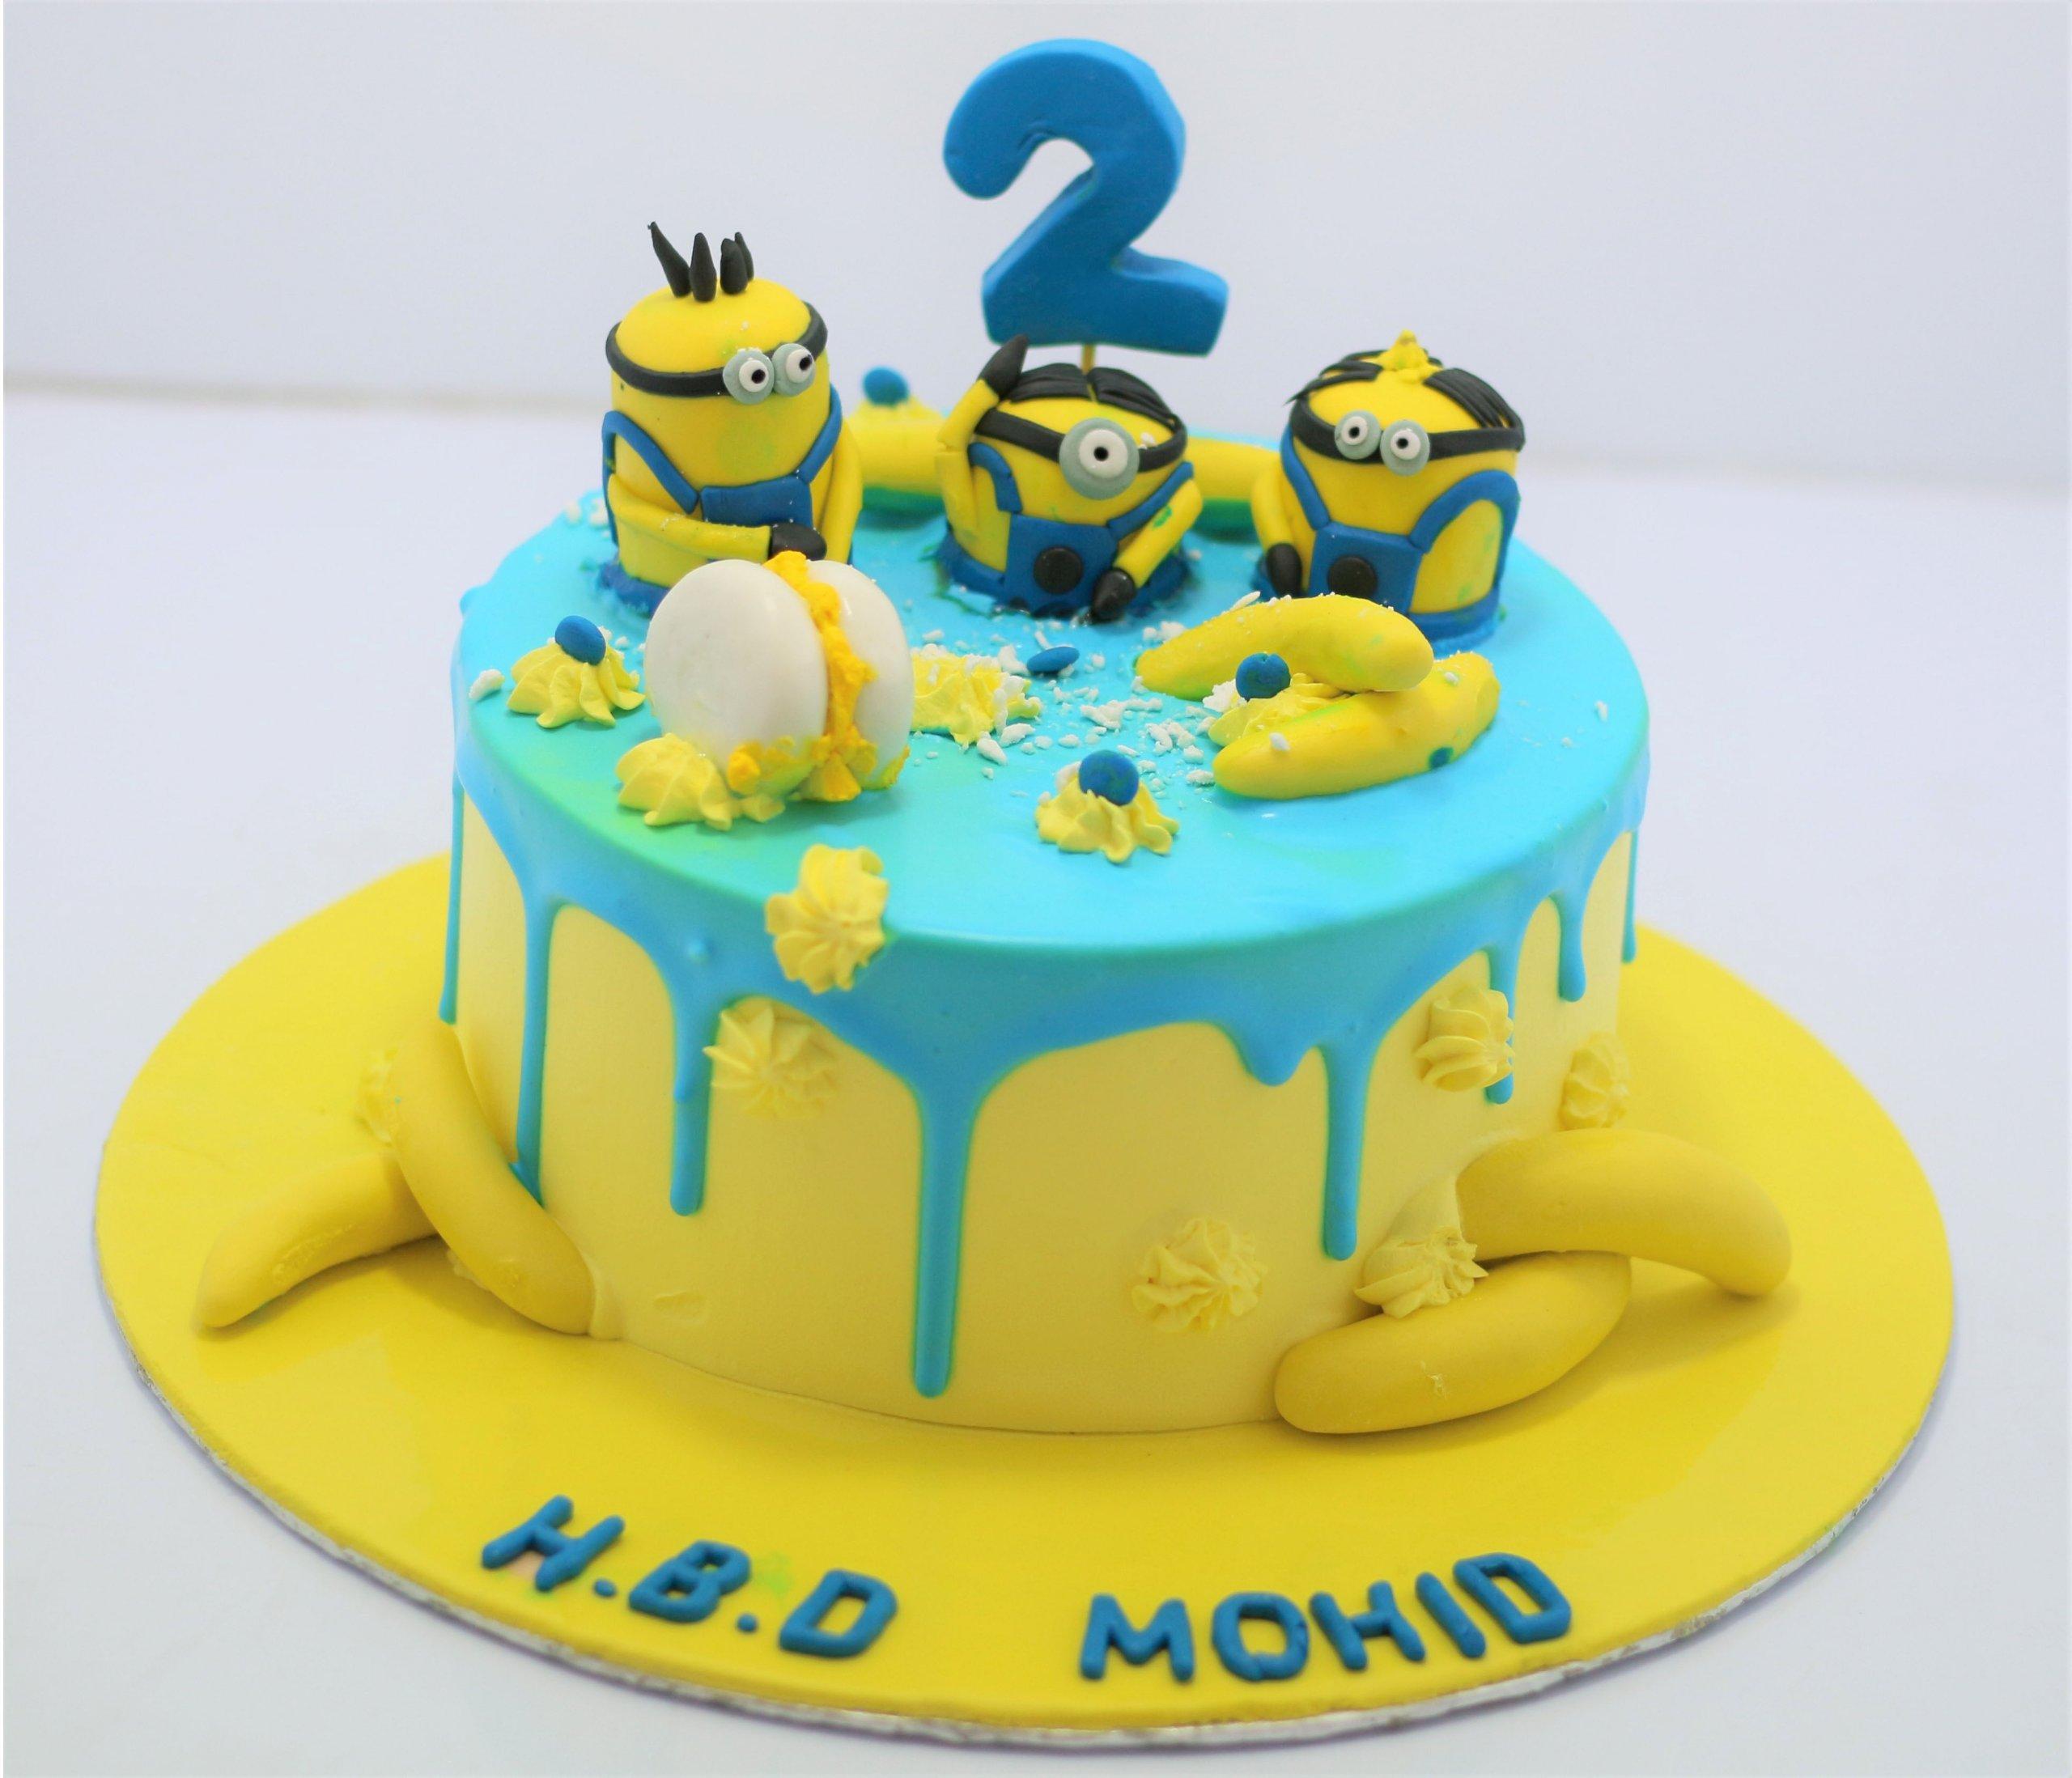 Brilliant Minion Birthday Cake Send Gifts To Pakistan From Canada Funny Birthday Cards Online Elaedamsfinfo